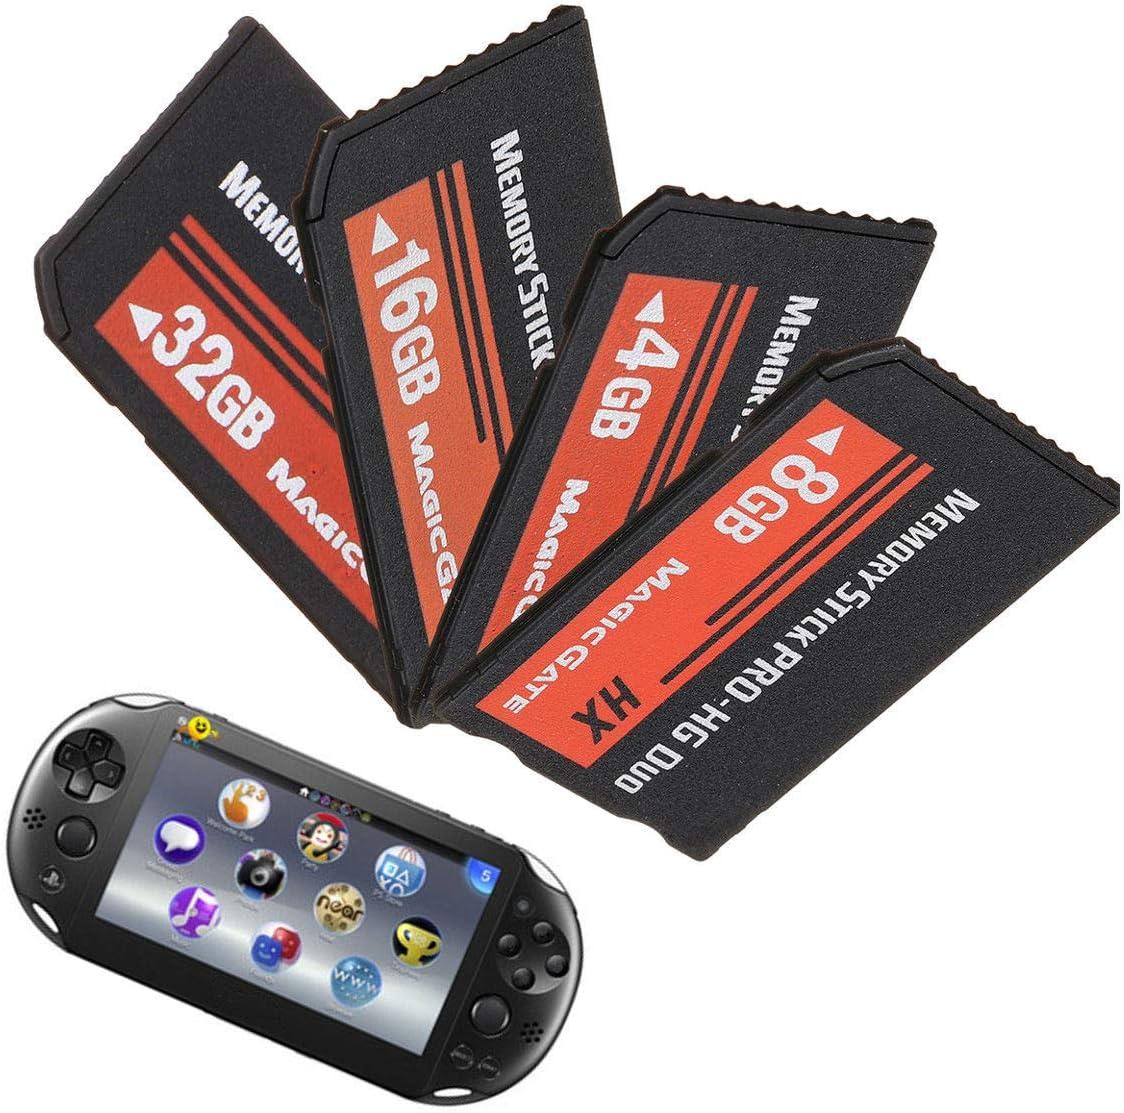 Bestlymood 8 GB Cle USB Ms Pro Duo Hx Flash Carte pour PSP Camera Cybershot